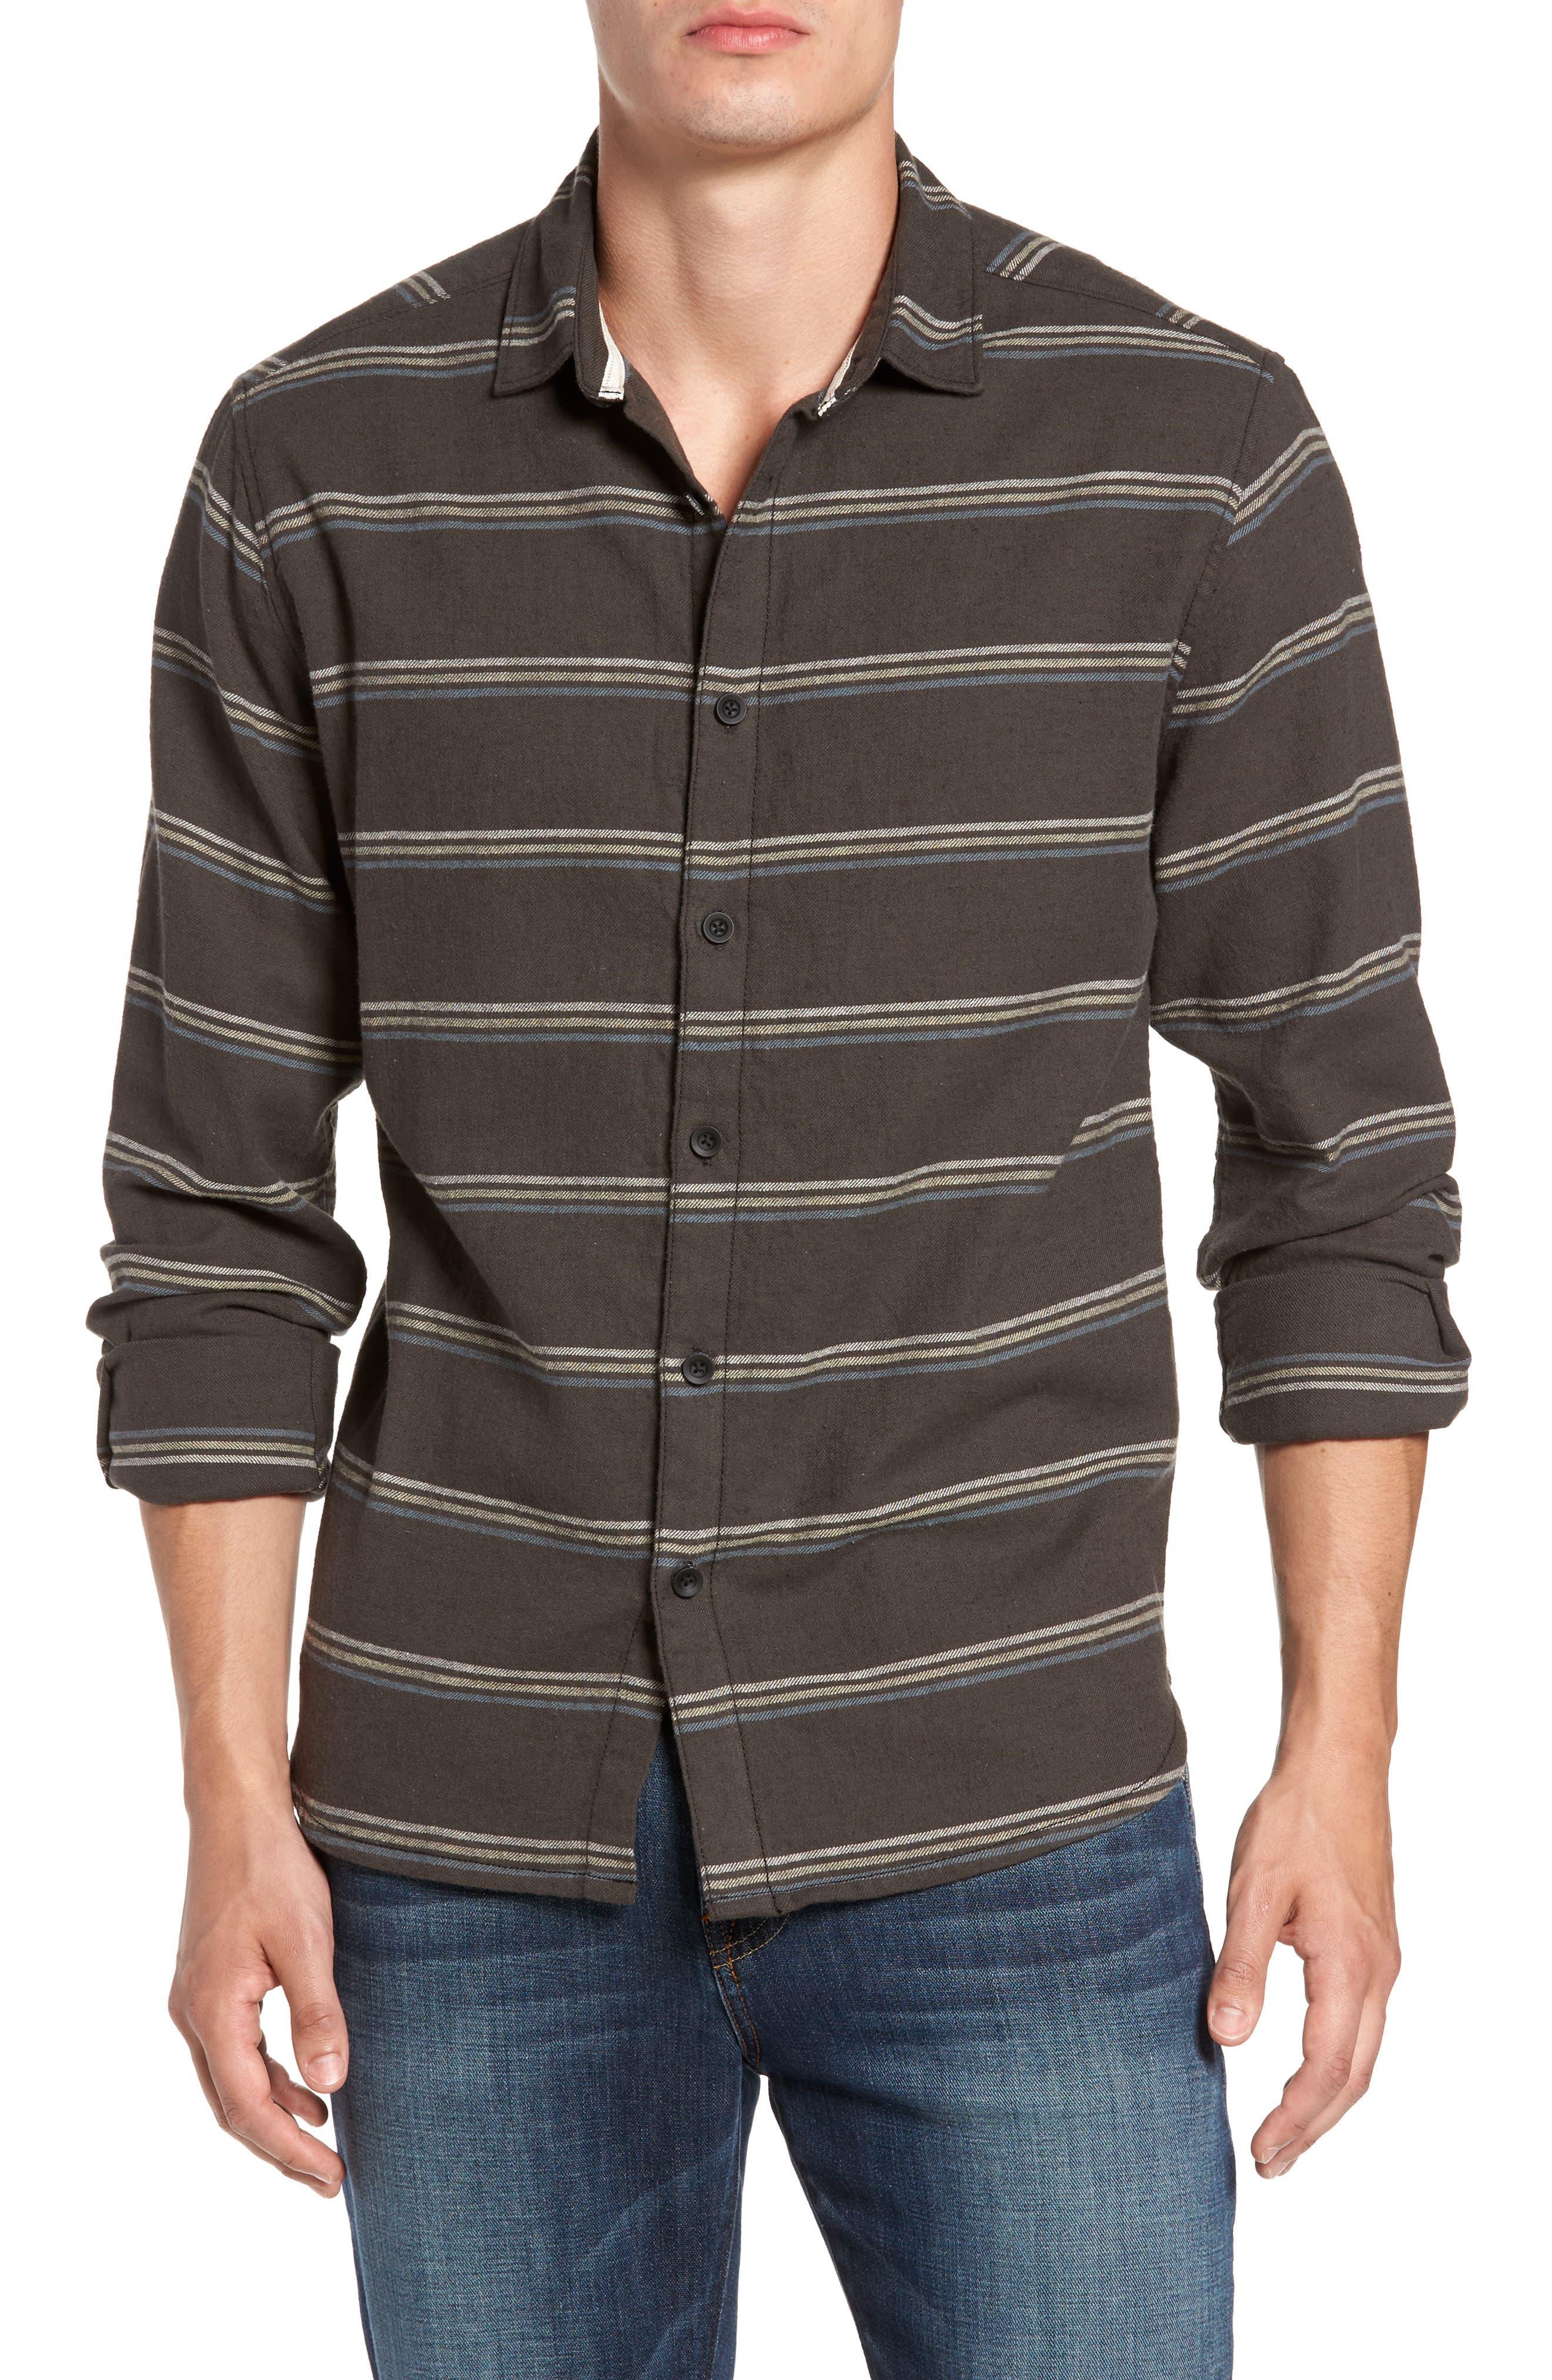 McKinley Stripe Shirt,                             Main thumbnail 1, color,                             Blackstone